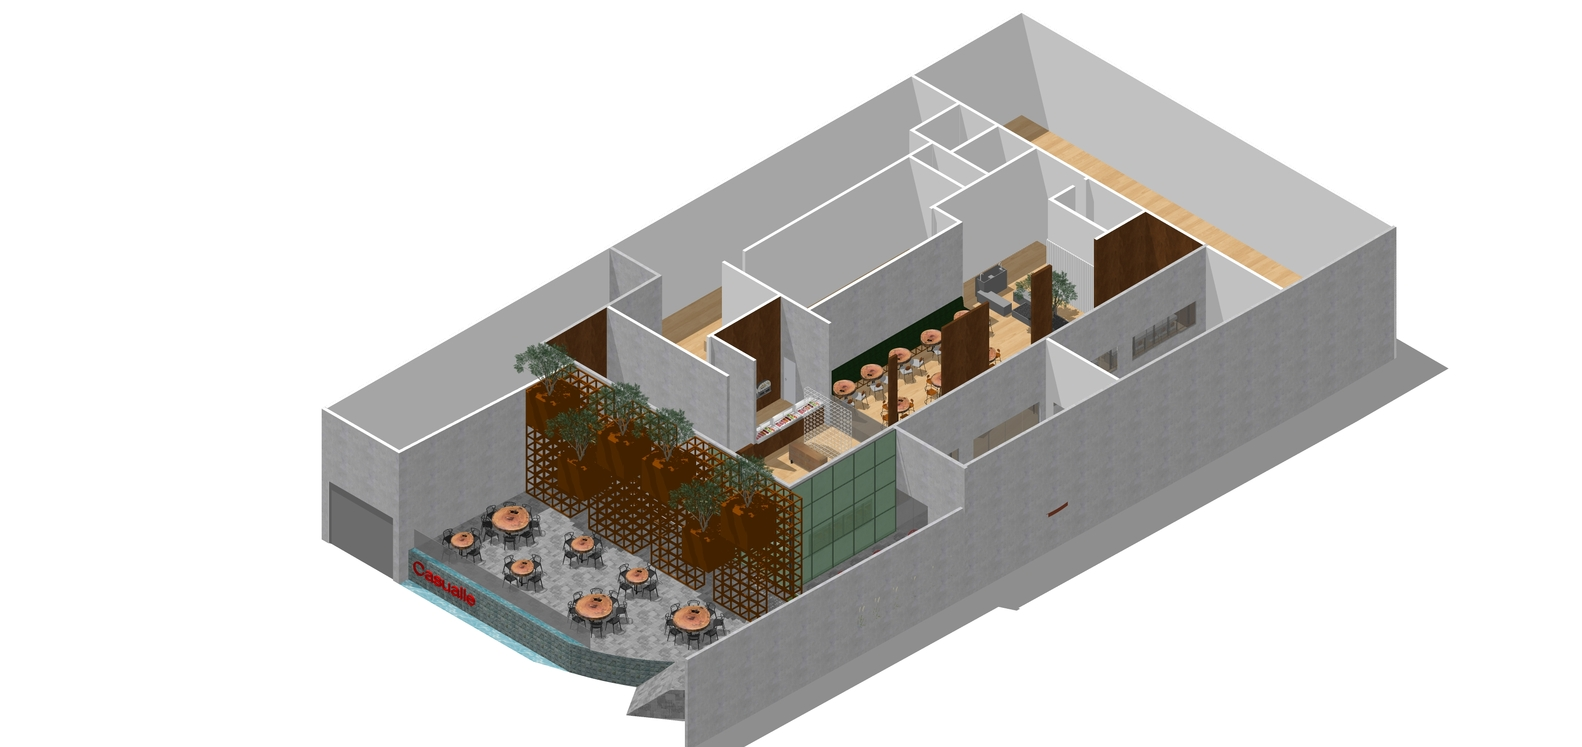 Pizzeria Casuale / Roby Macedo arquitetura e design, Axonometric